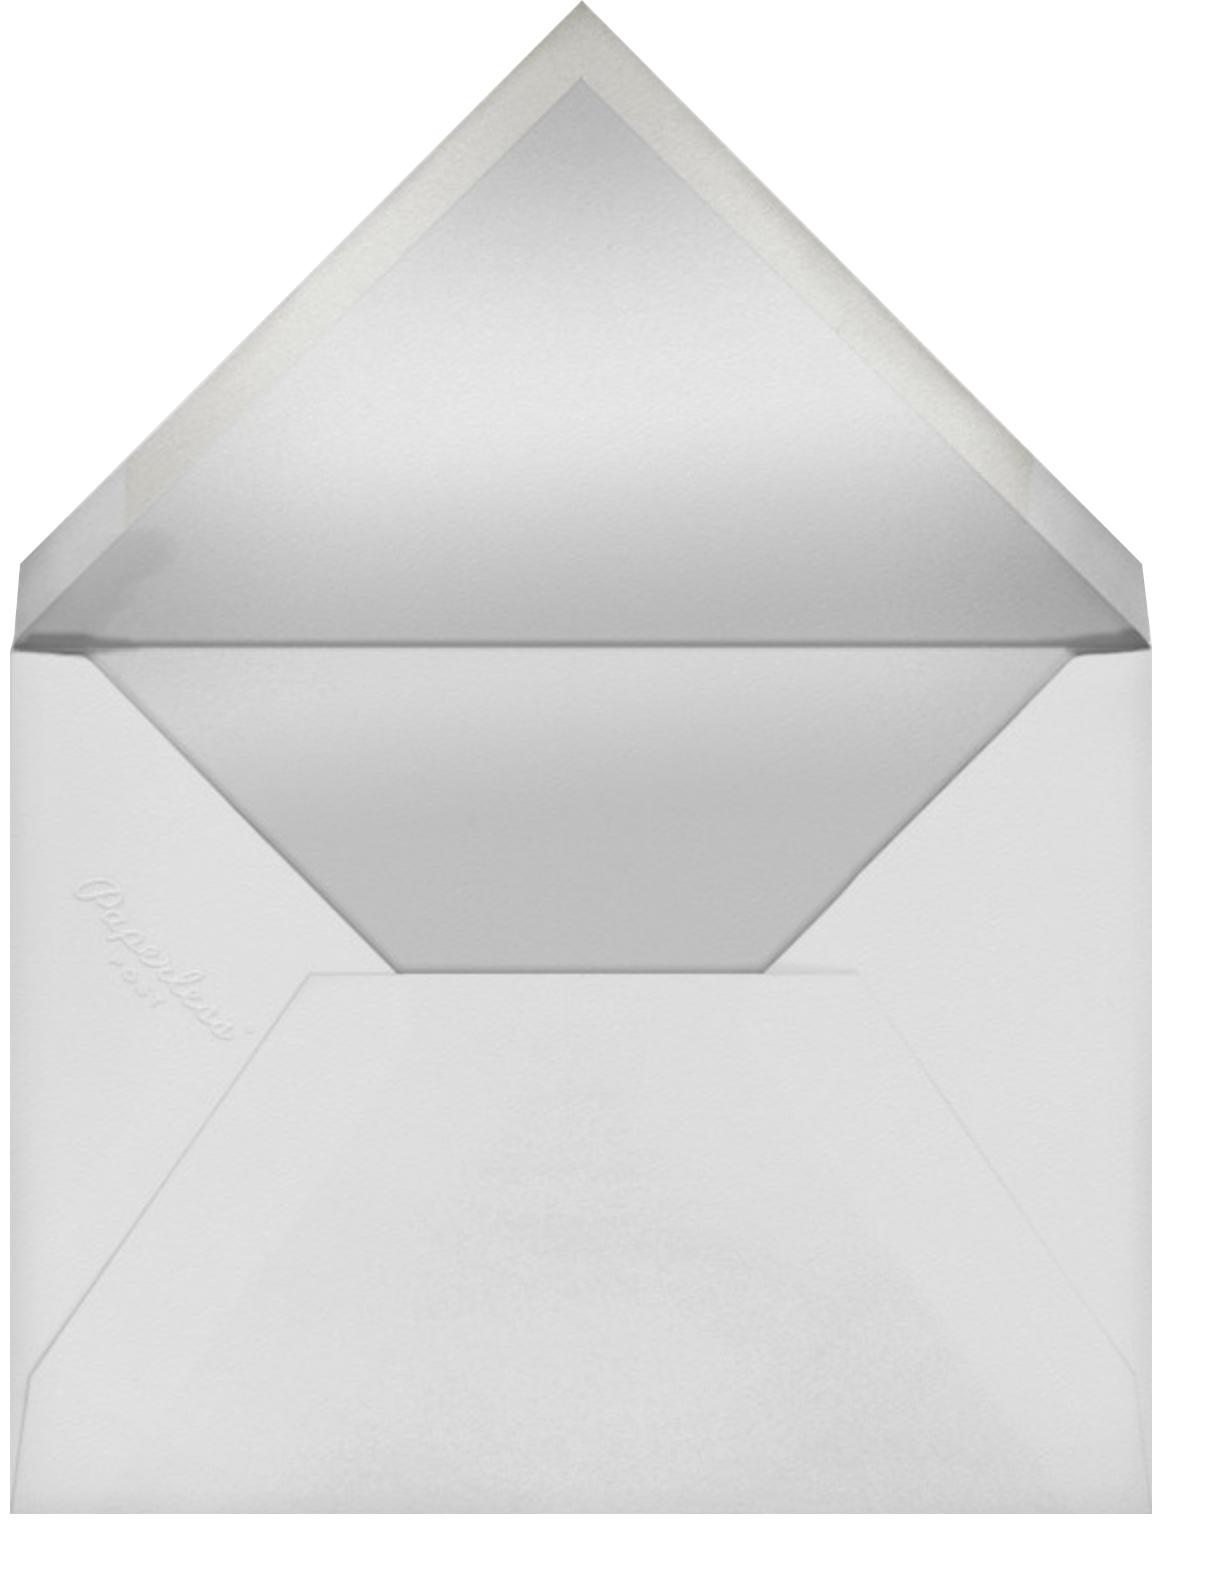 Trophy Mug - Paperless Post - Father's Day - envelope back